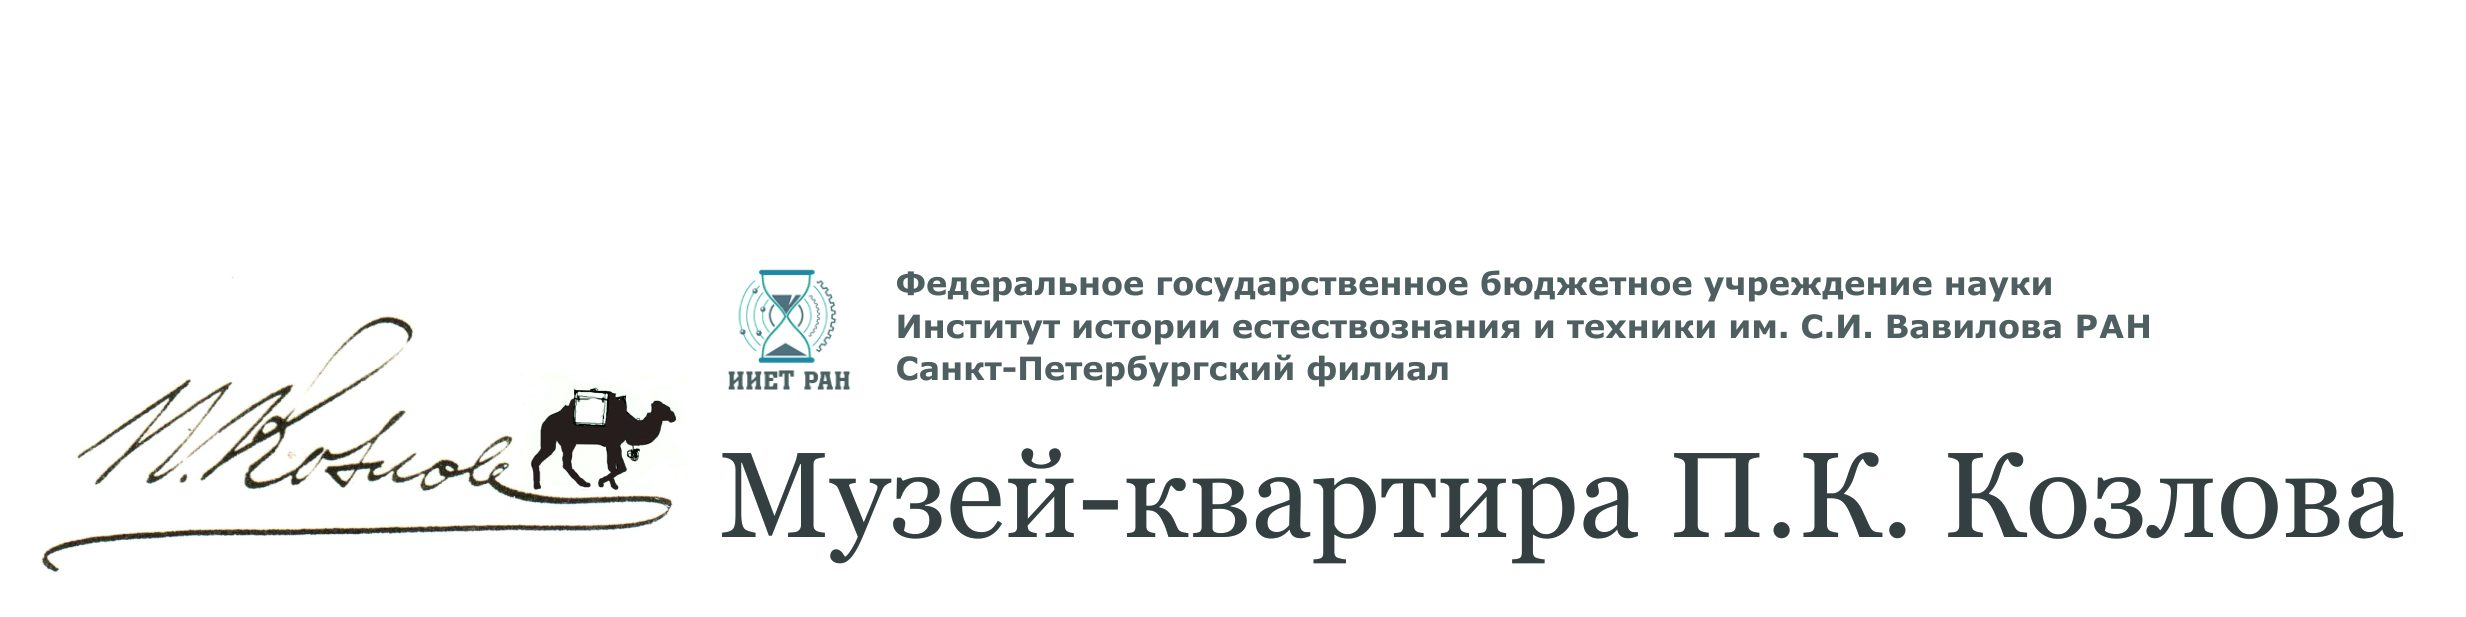 Музей-квартира П.К. Козлова